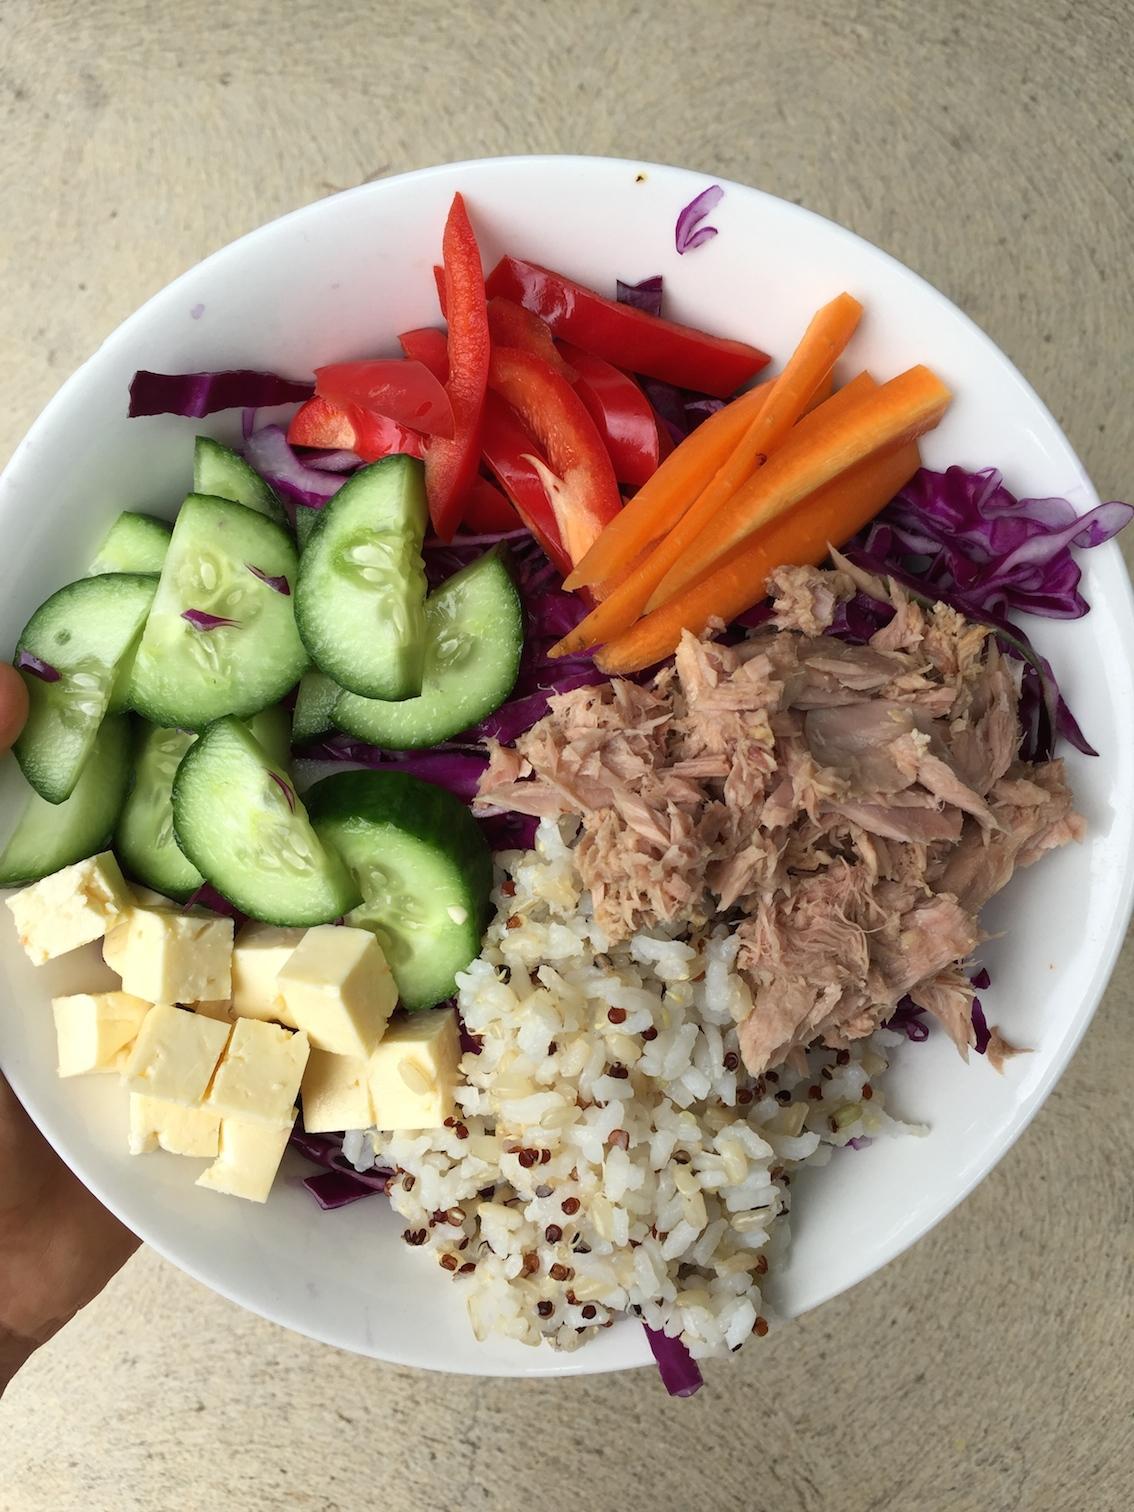 A colourful salad bowl.